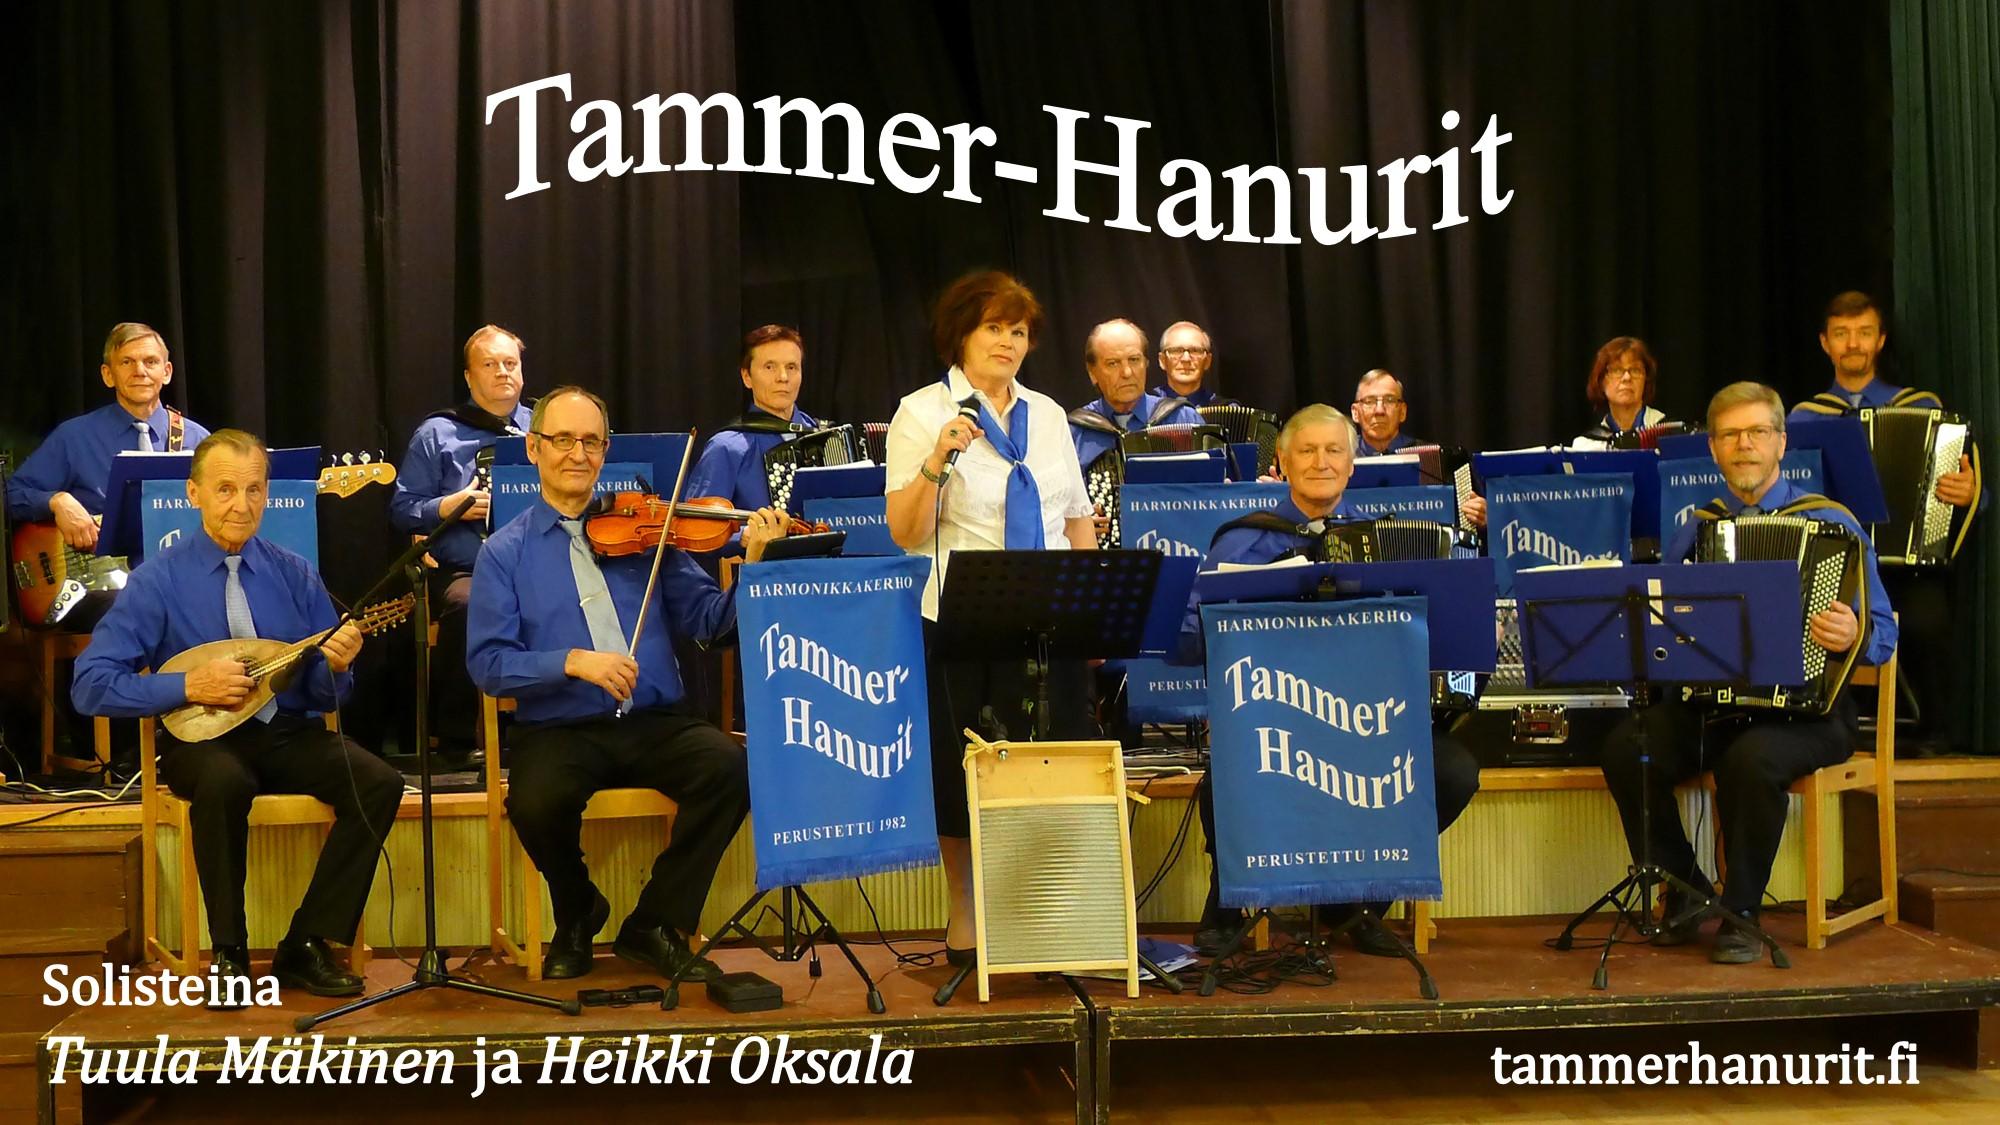 Tammer-Hanurit